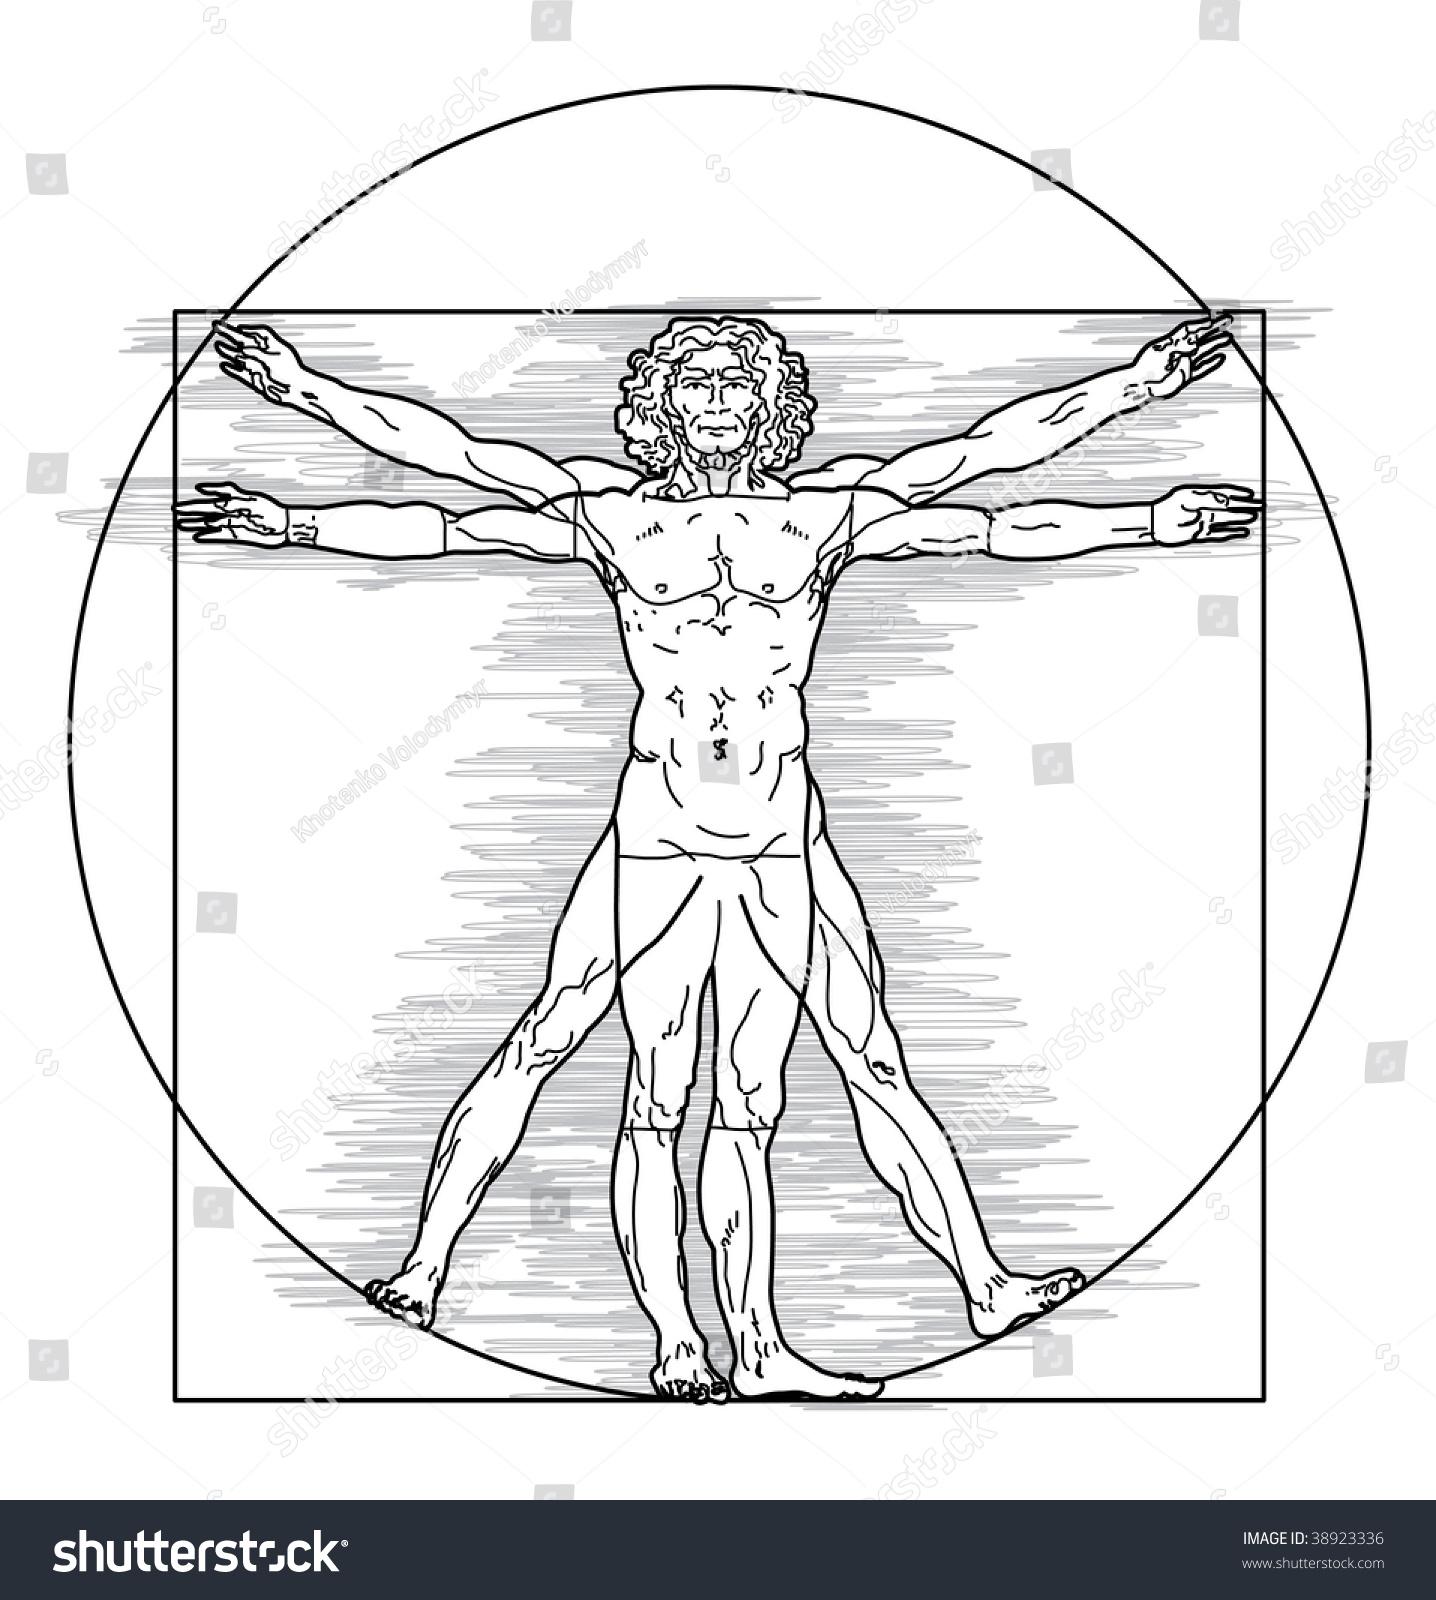 Leonardo Da Vincis Vitruvian Man Vector Stock Vector (Royalty Free ...